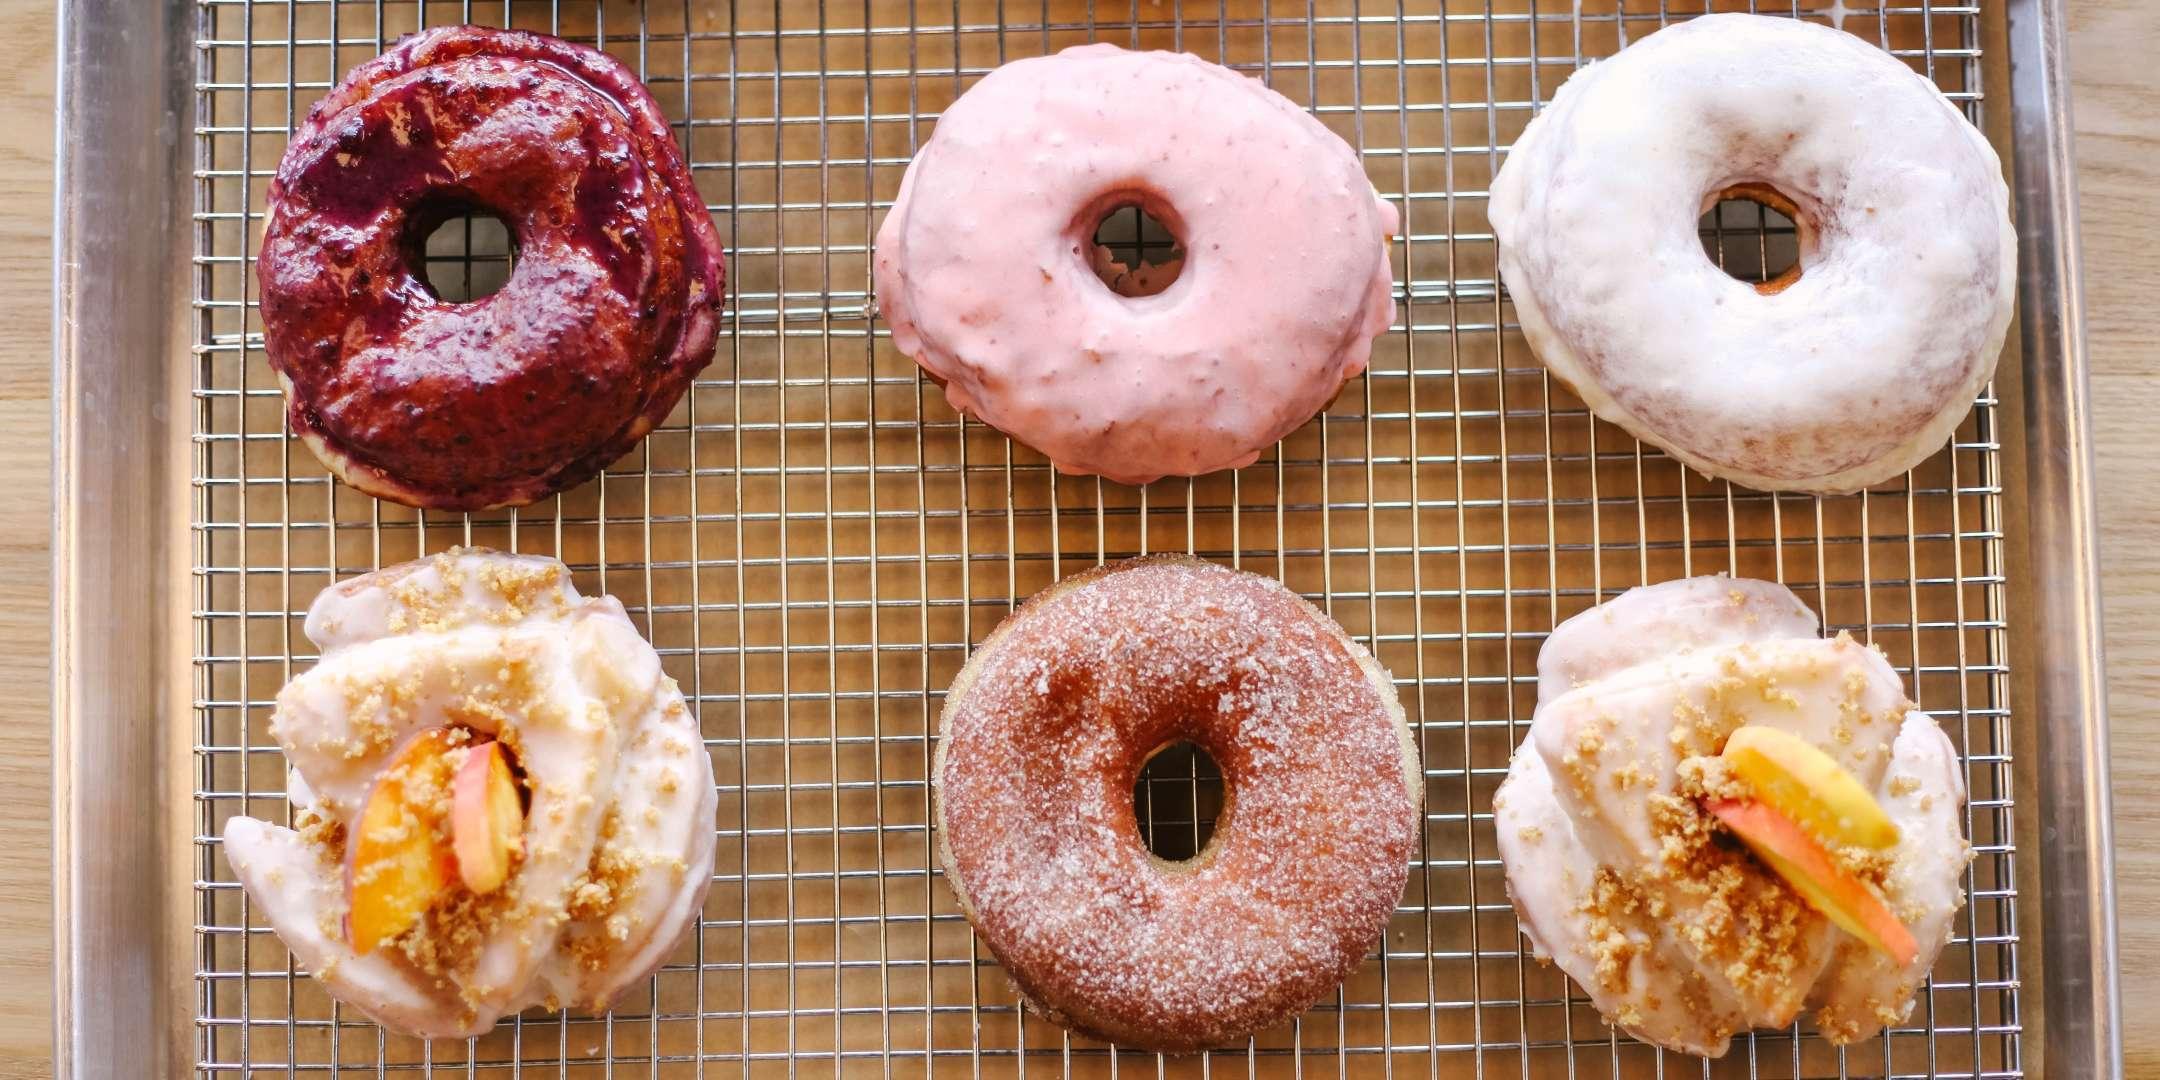 Doughnut Workshop - Team Building by Cozymeal™